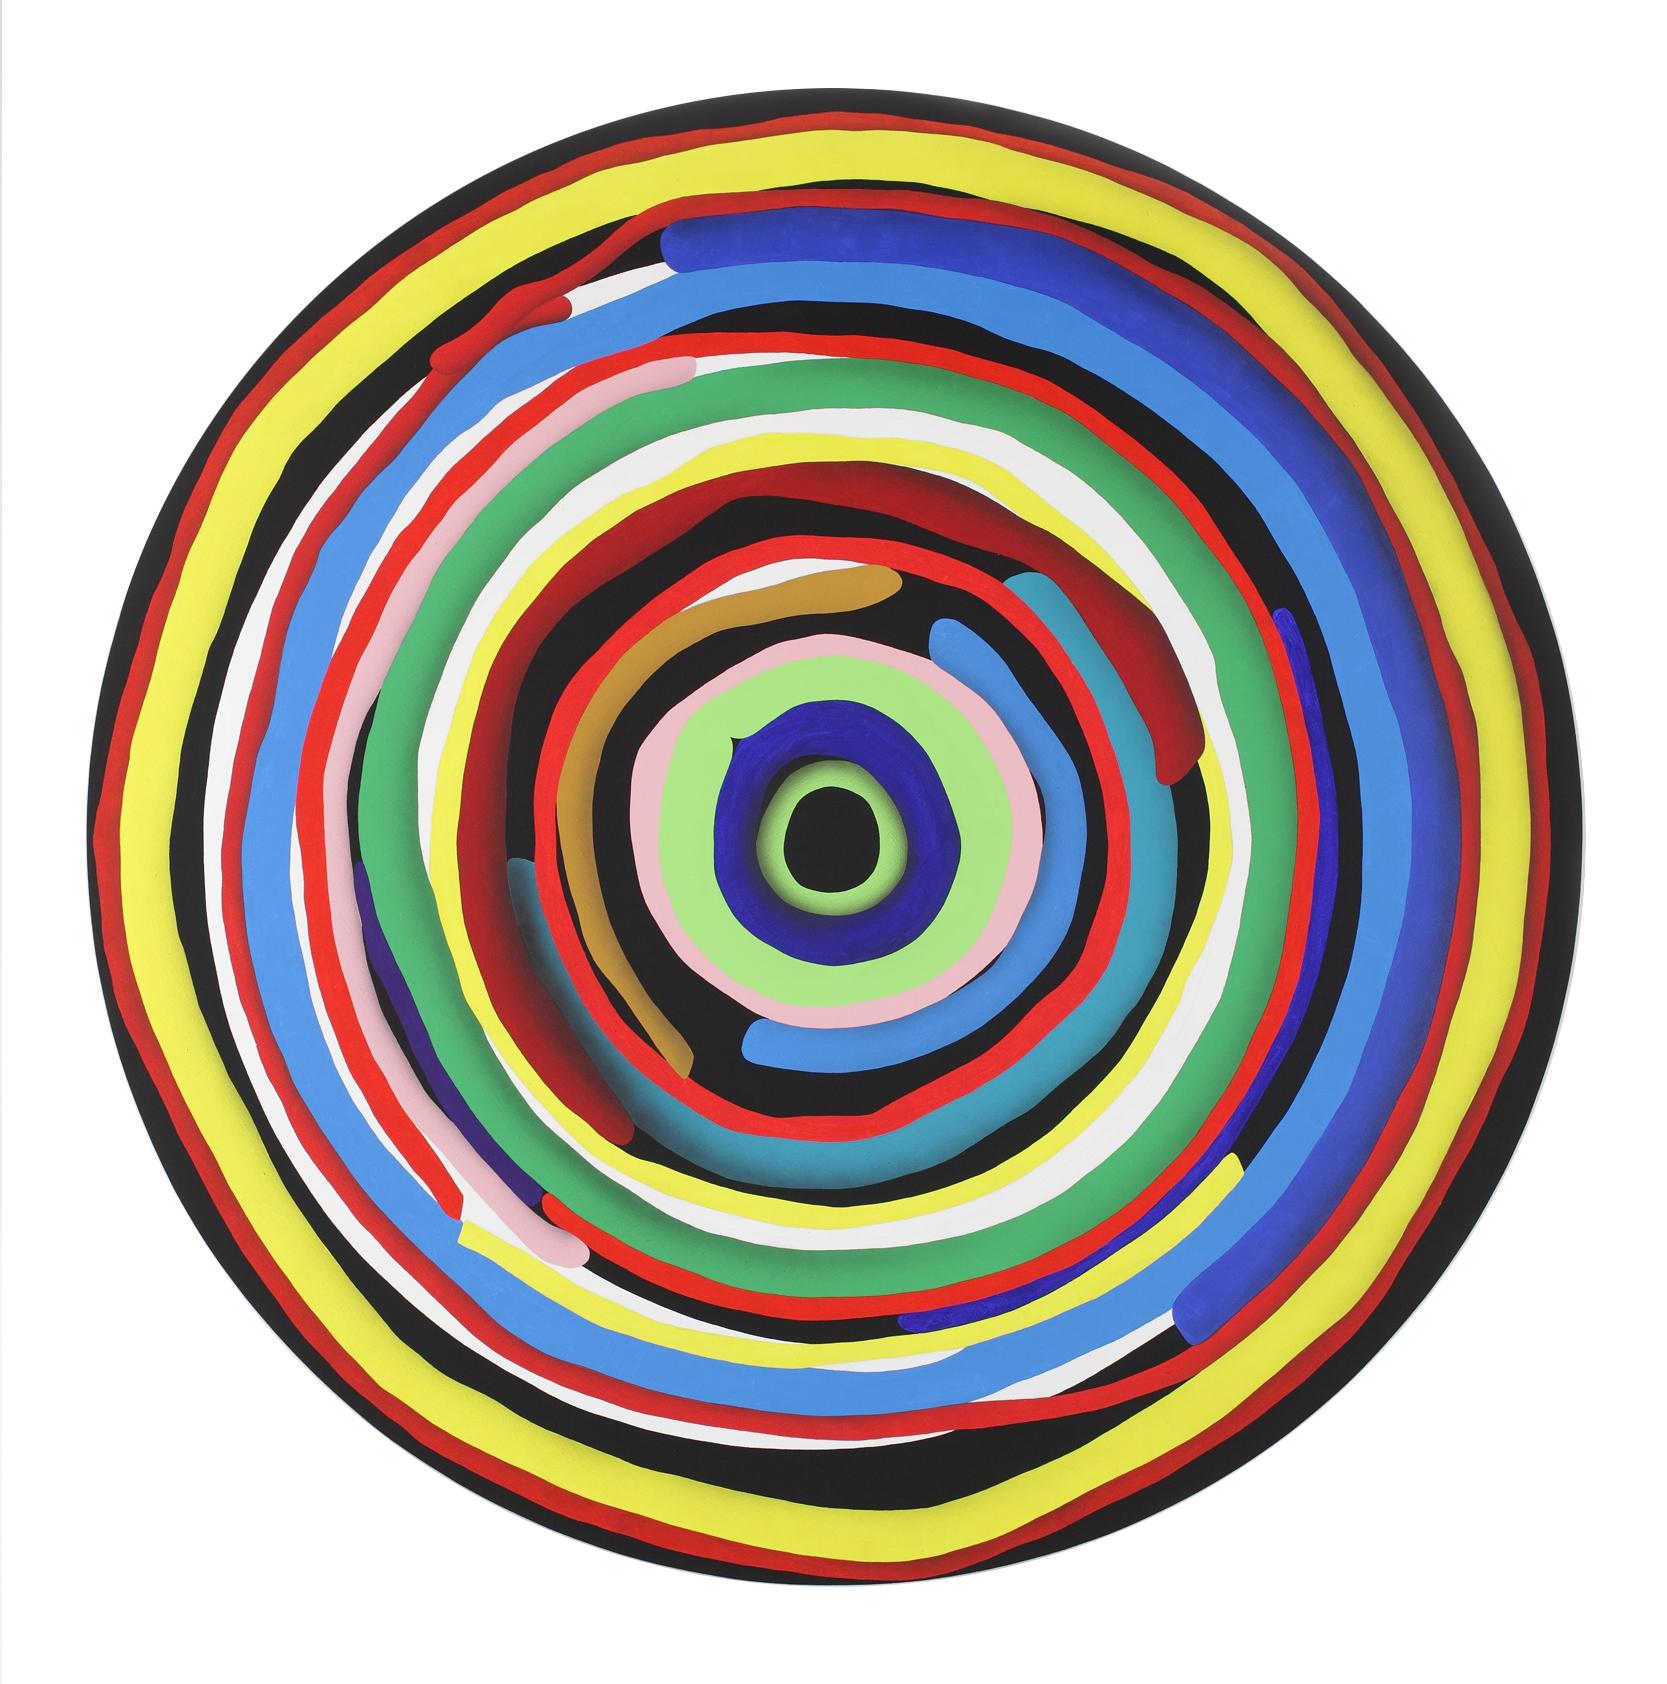 Mandala No. 13 /Target II./ 2012, acrylic on canvas, 200 x 200 cm